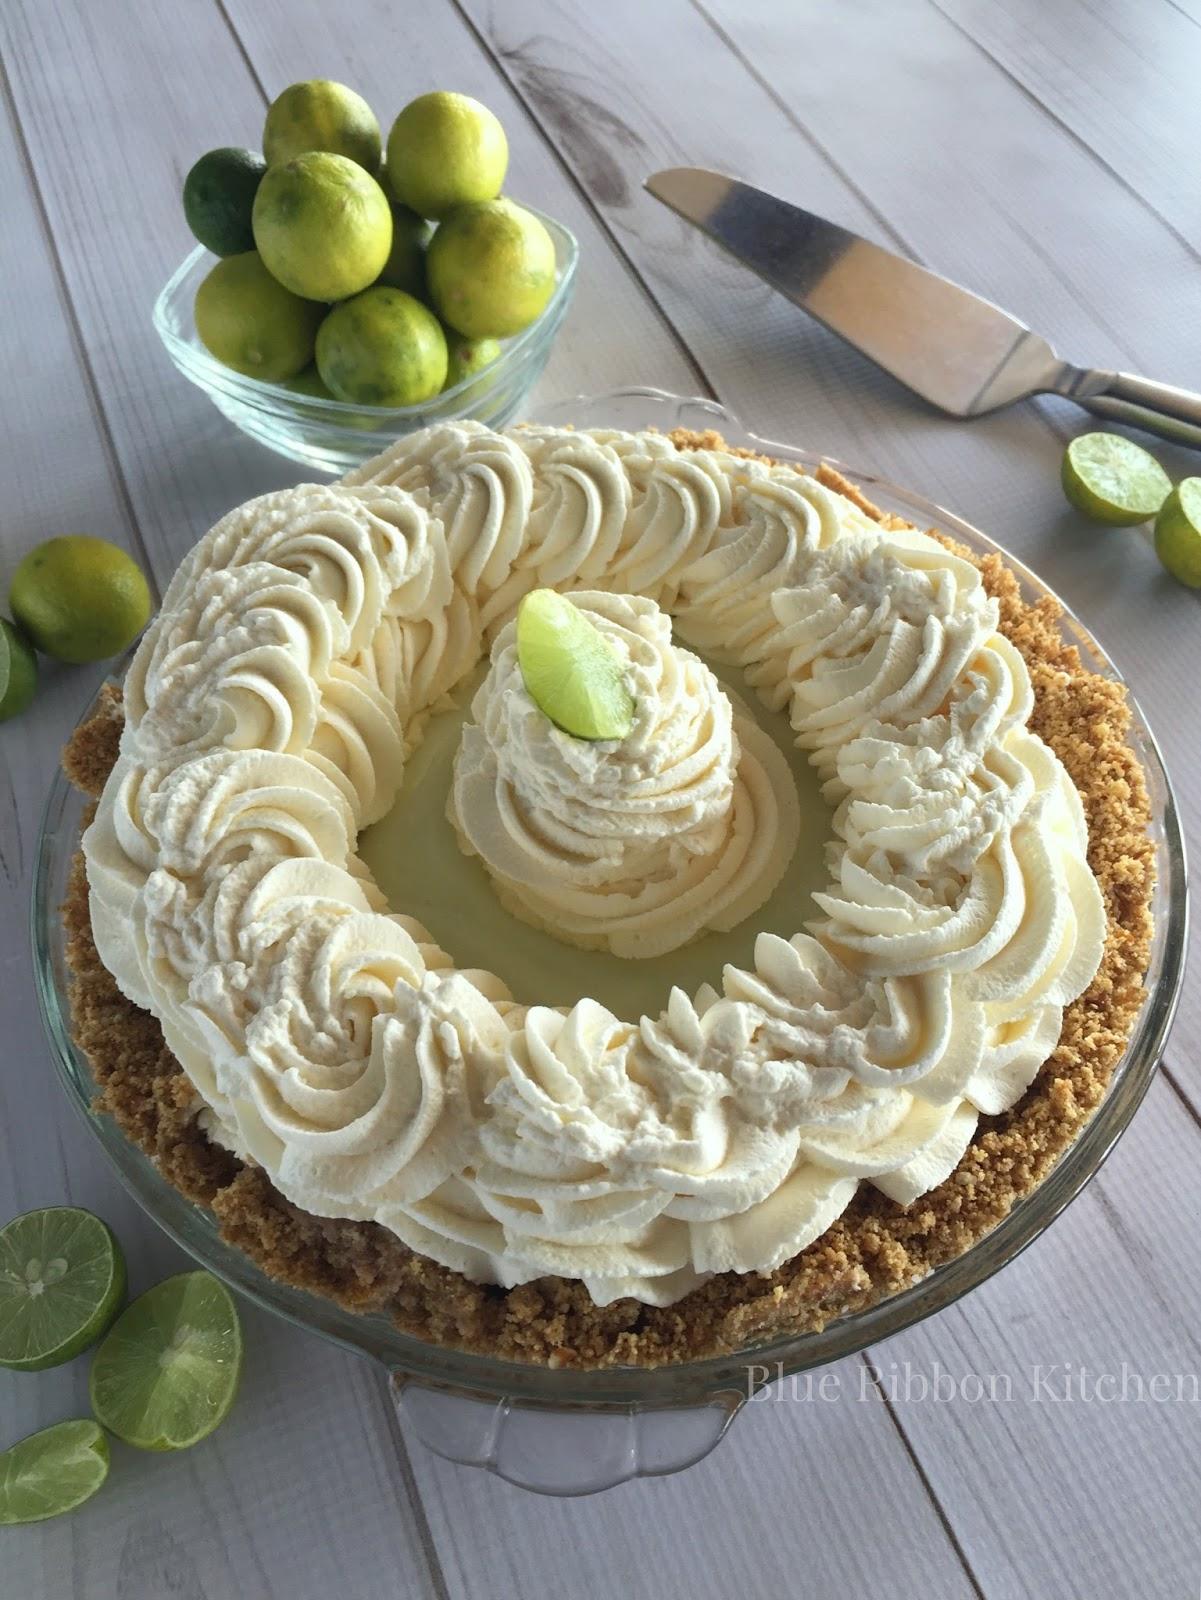 Blue Ribbon Kitchen Individual Margarita Key Lime Pies